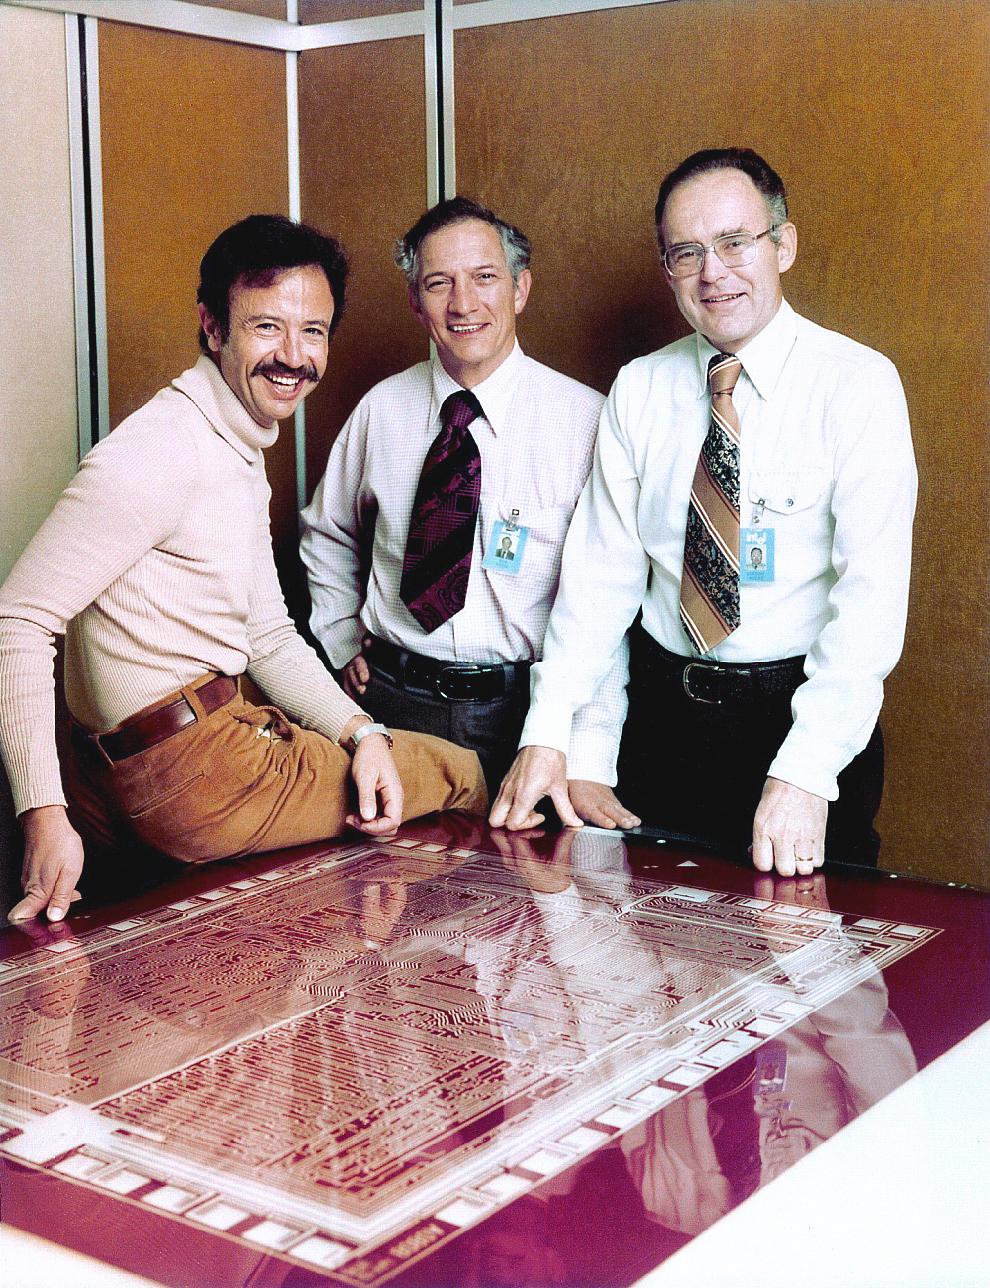 Andy Grove, Robert Noyce and Gordon Moore (1978)